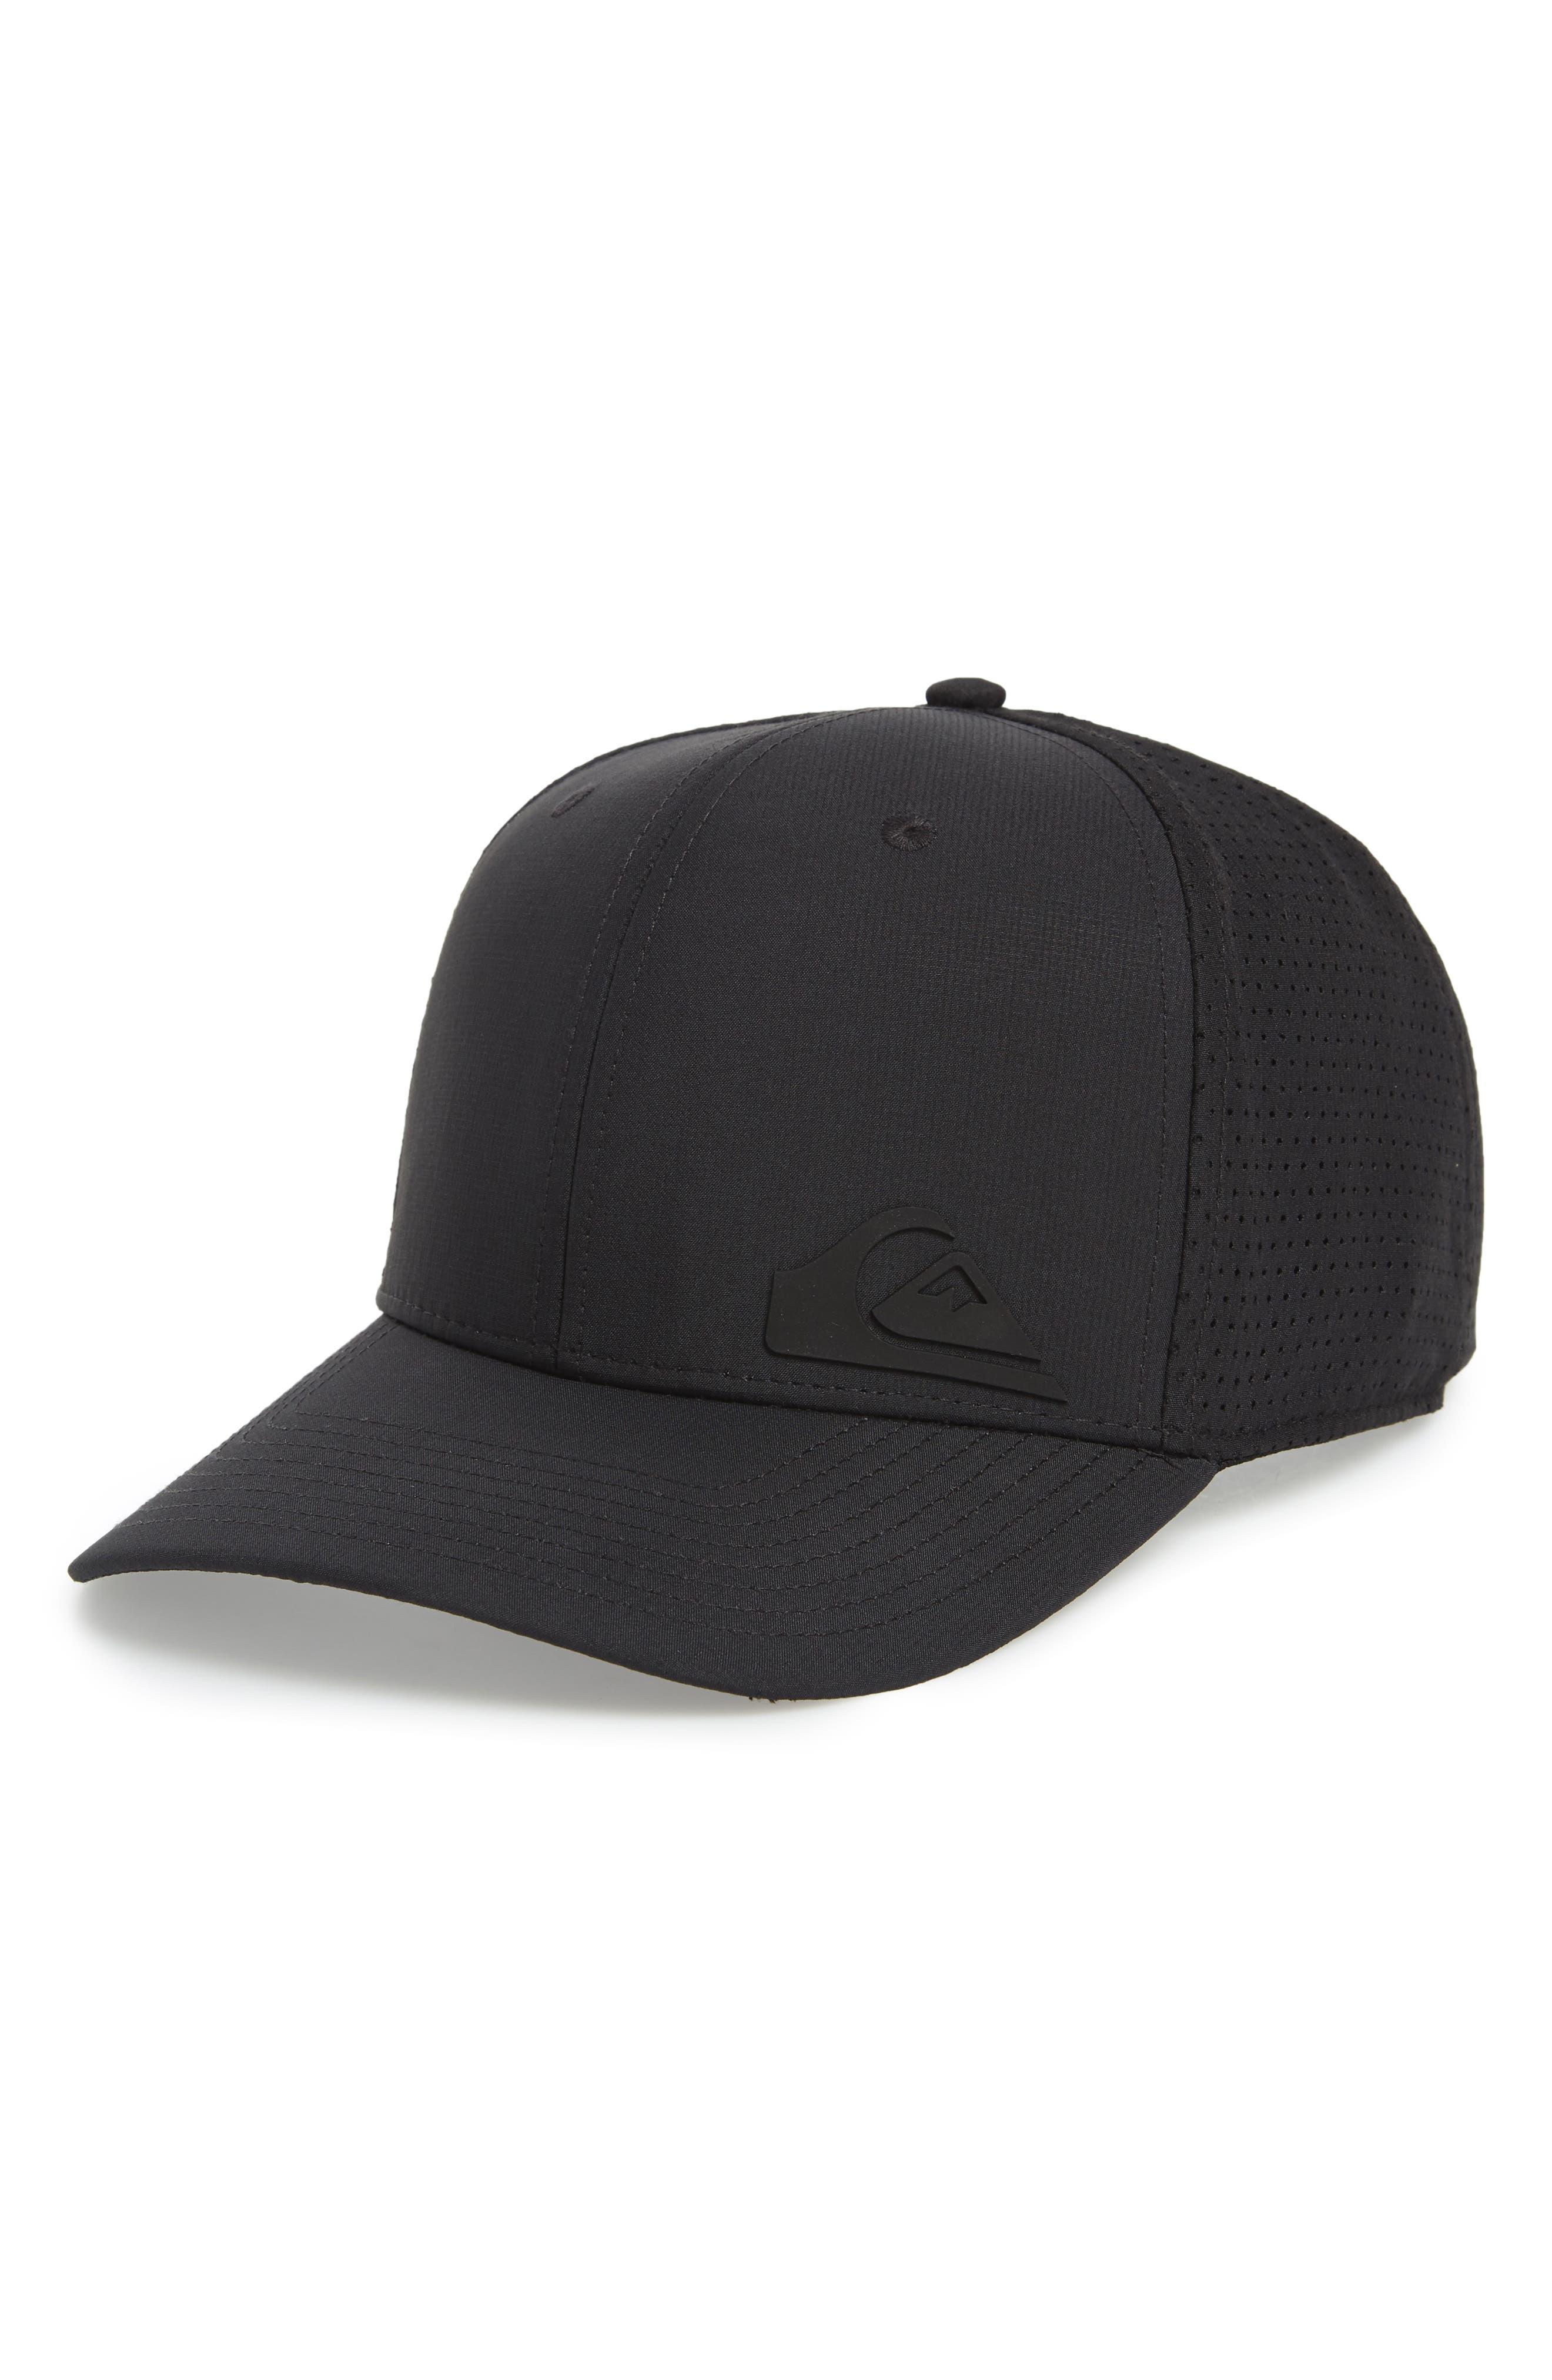 Technabutter 2 Baseball Cap,                         Main,                         color, 002